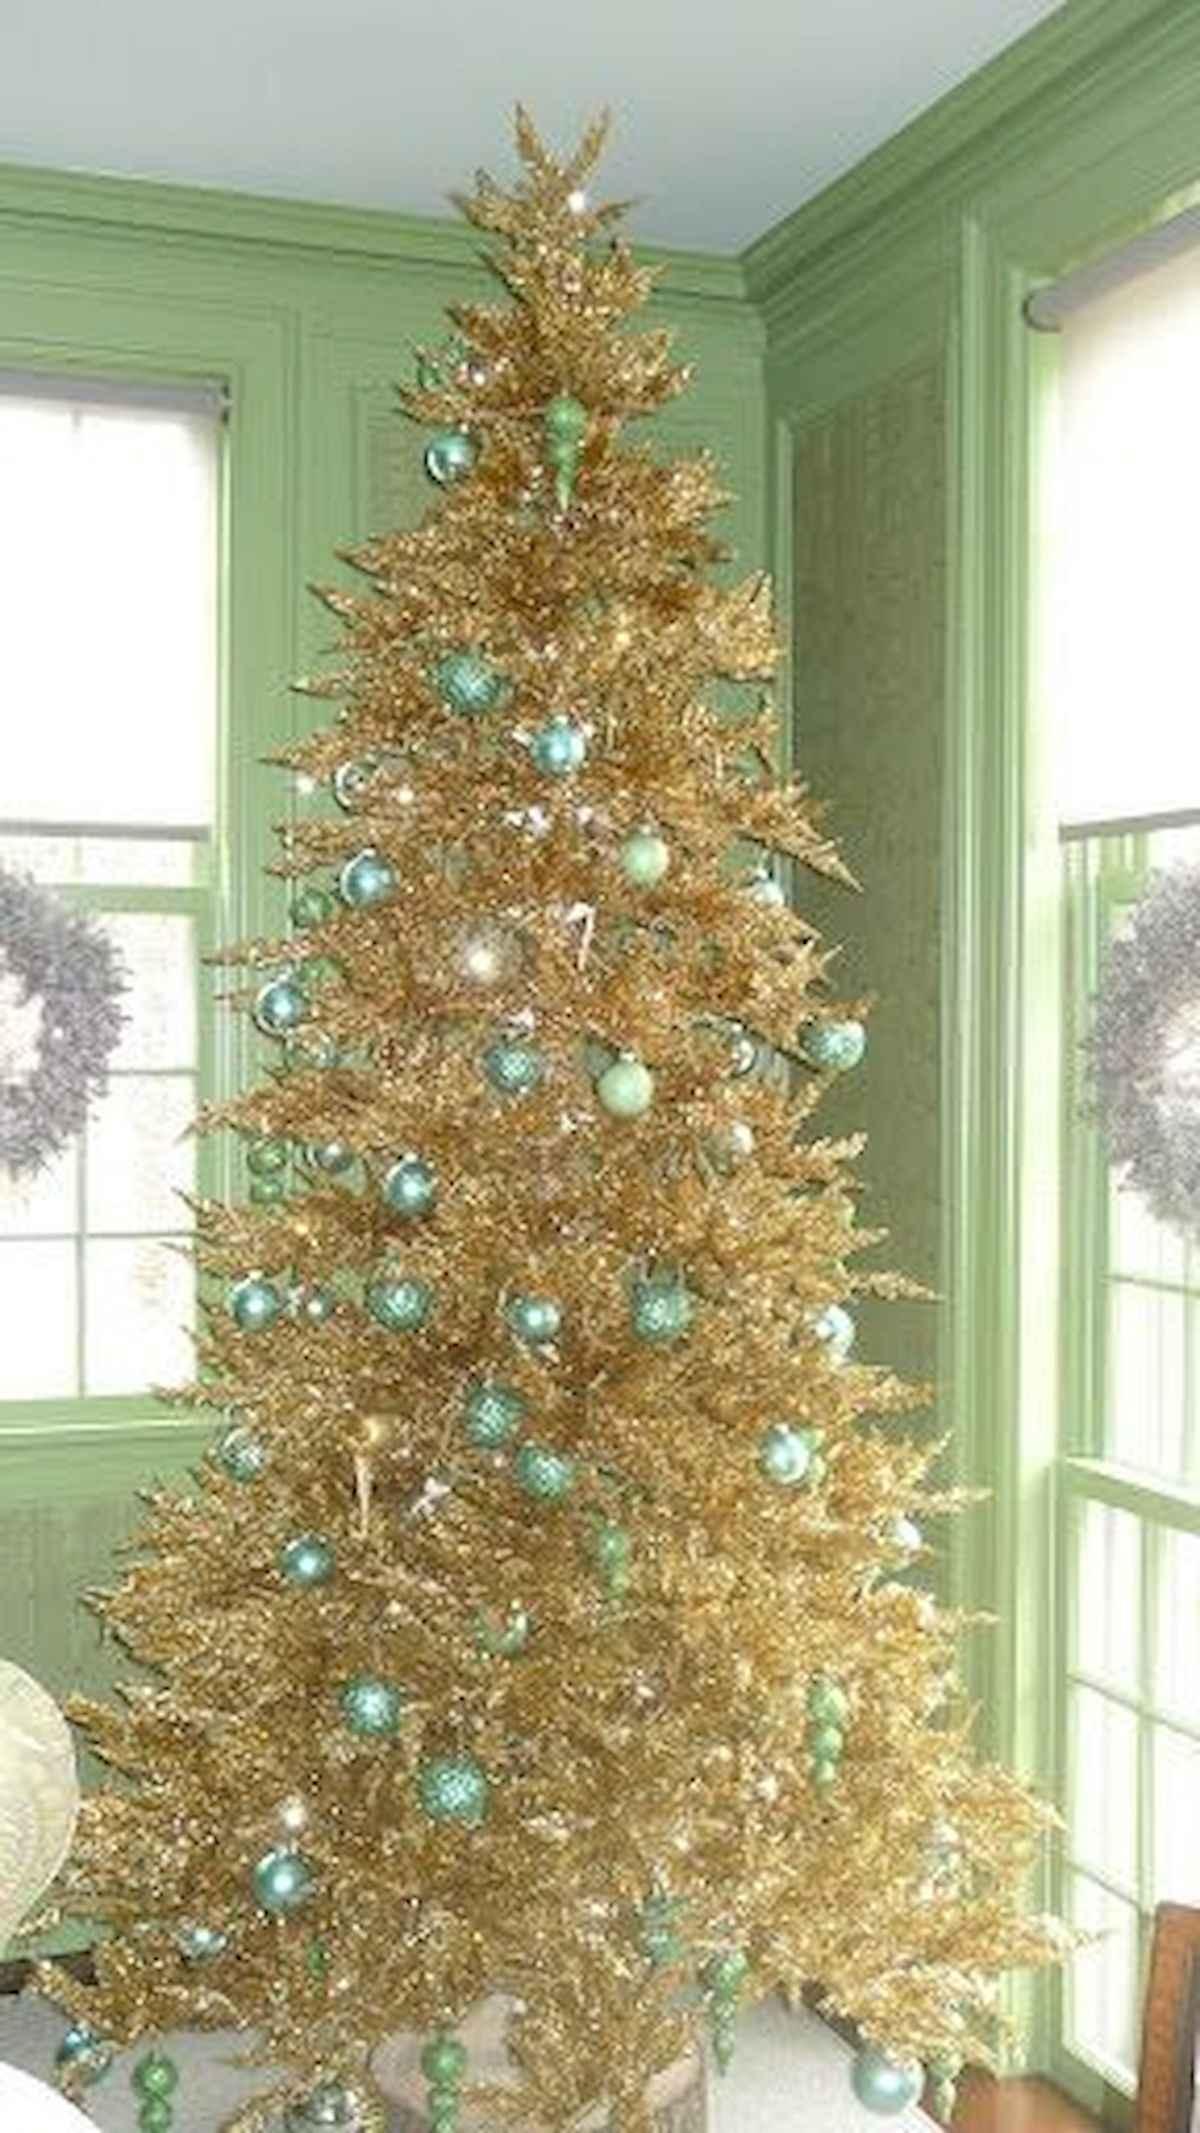 40 elegant christmas tree decorations ideas (29)